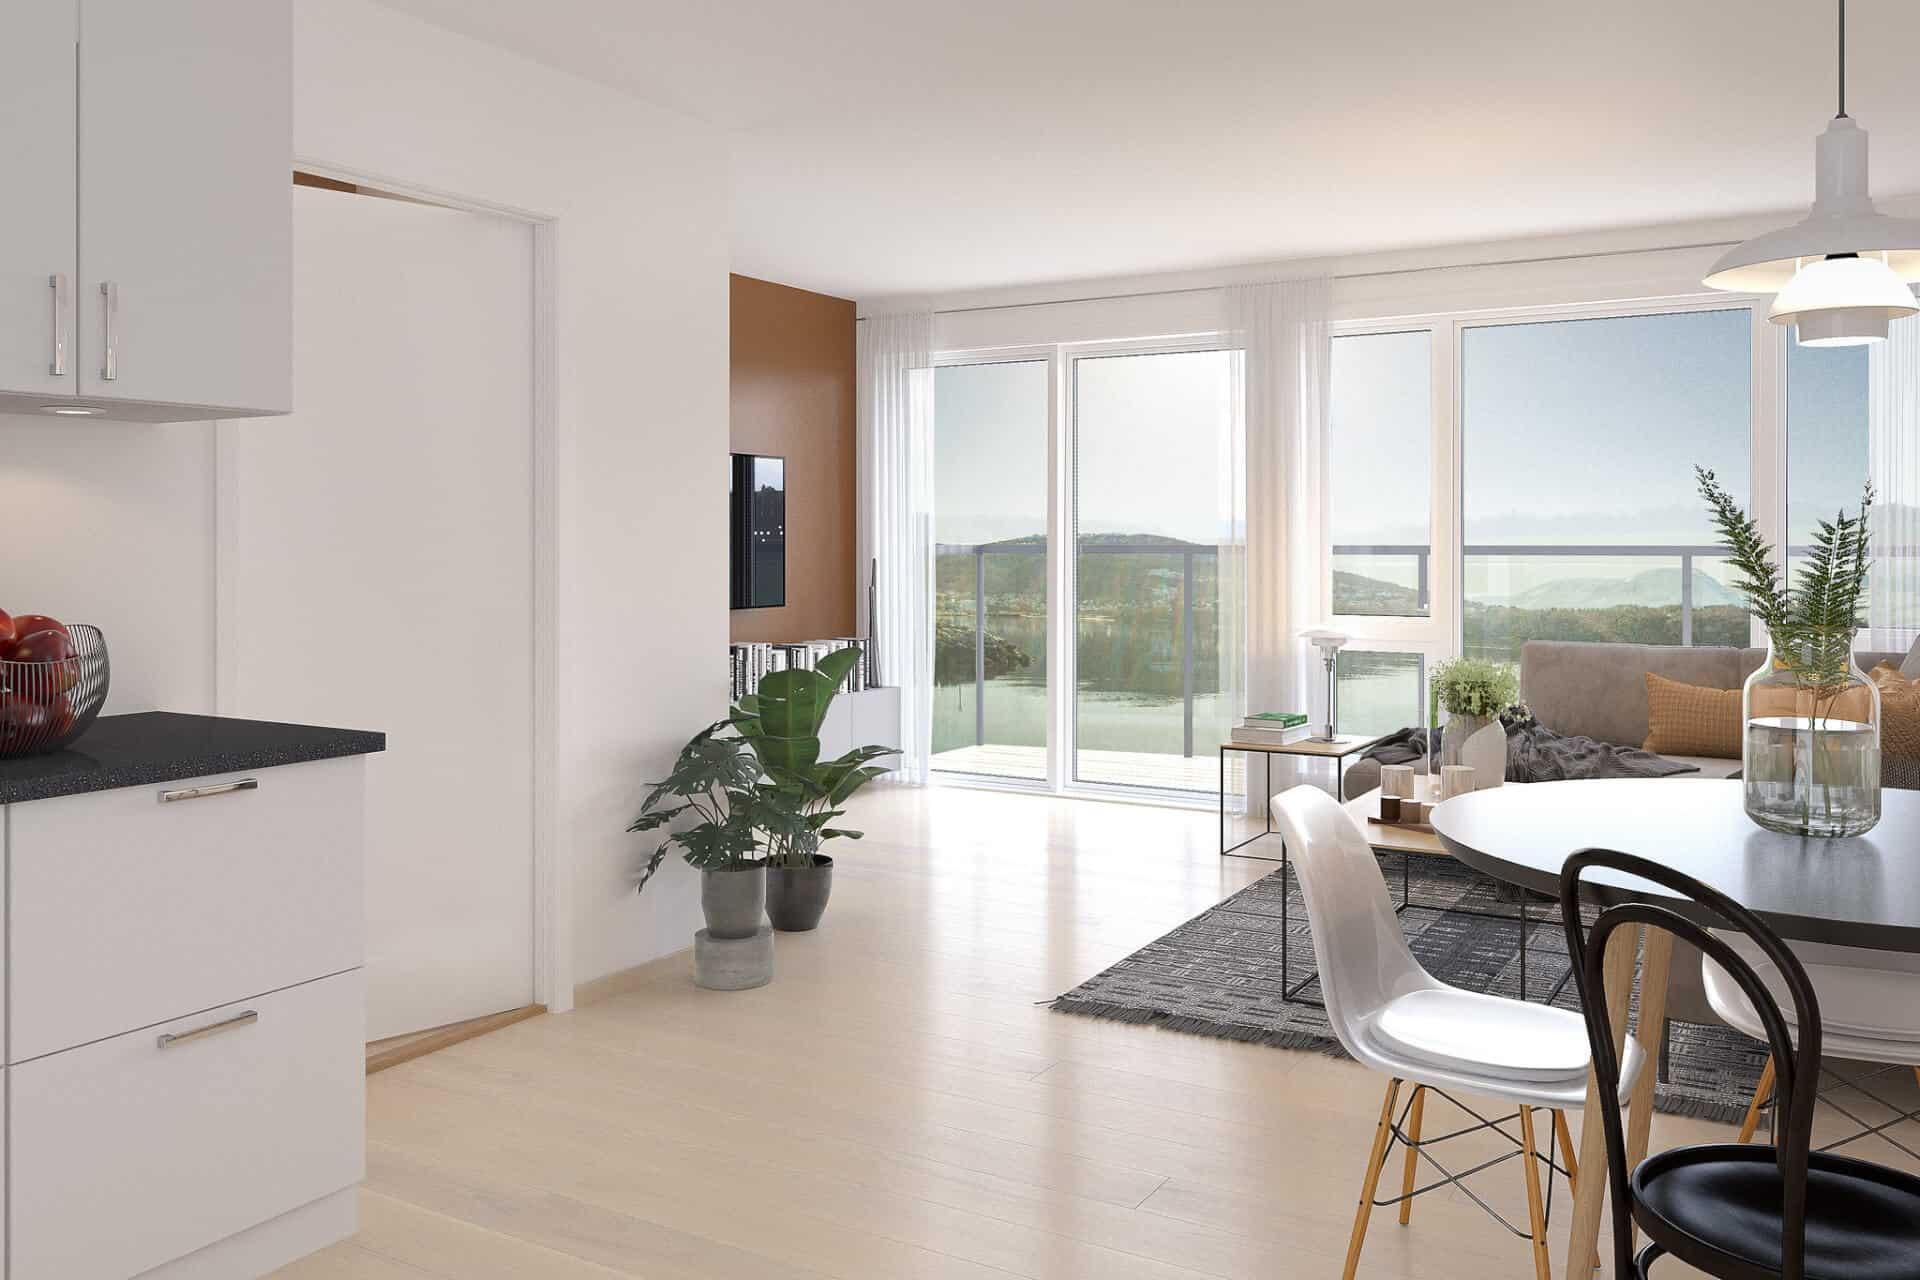 Vigør bolig PEAB Borgundfjord Ålesund 2-roms leilighet